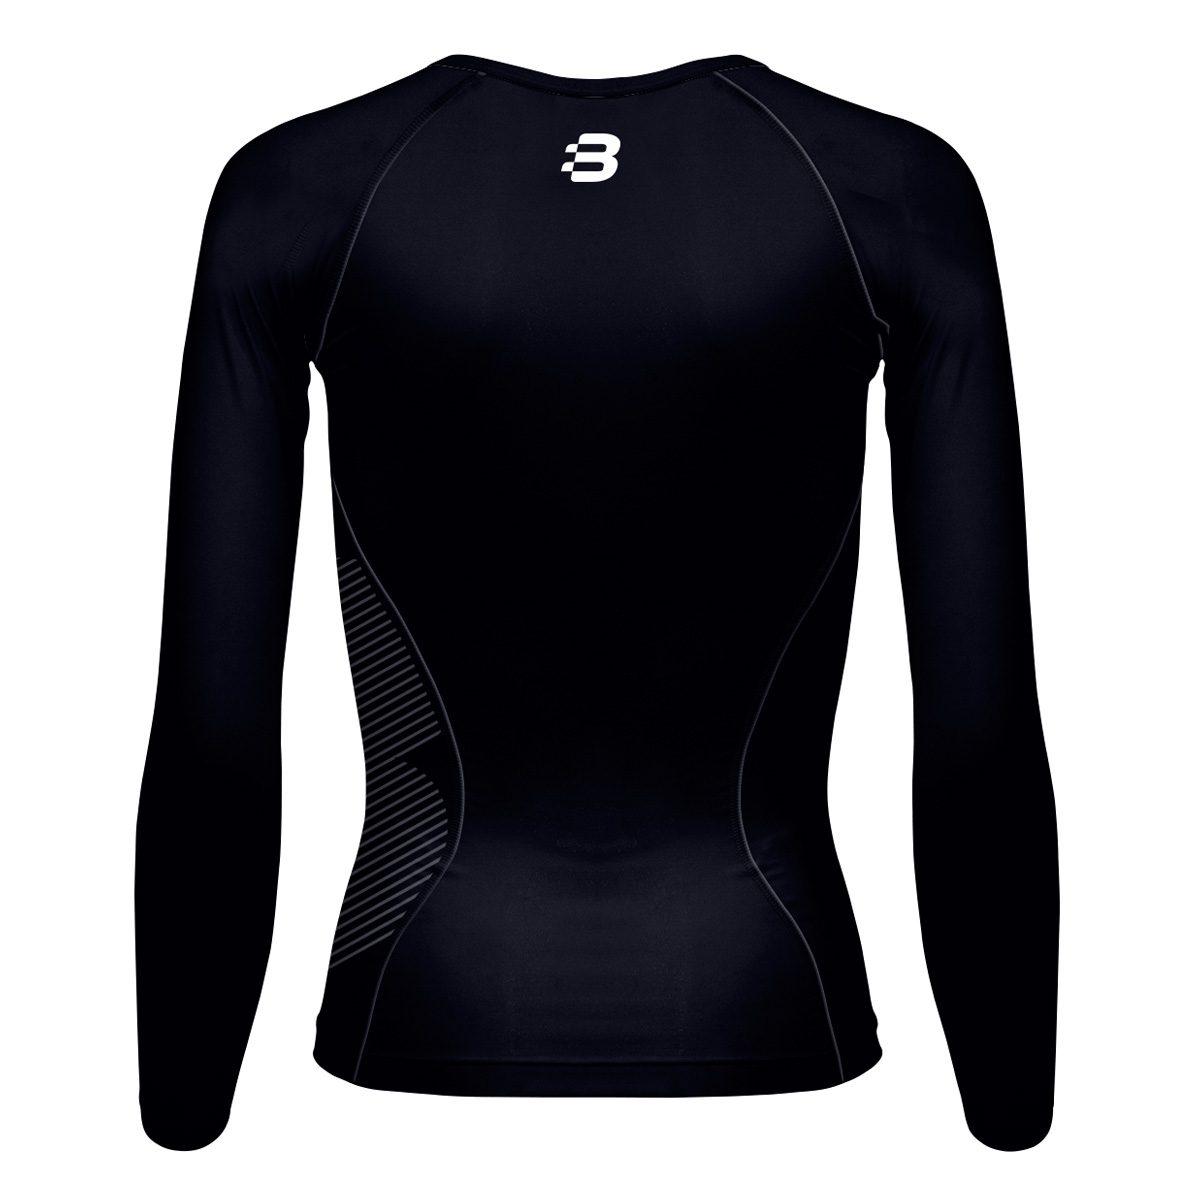 5e3de4bf1c3 Ladies navy blue compression t-shirt · Women s navy compression long sleeve  top - back